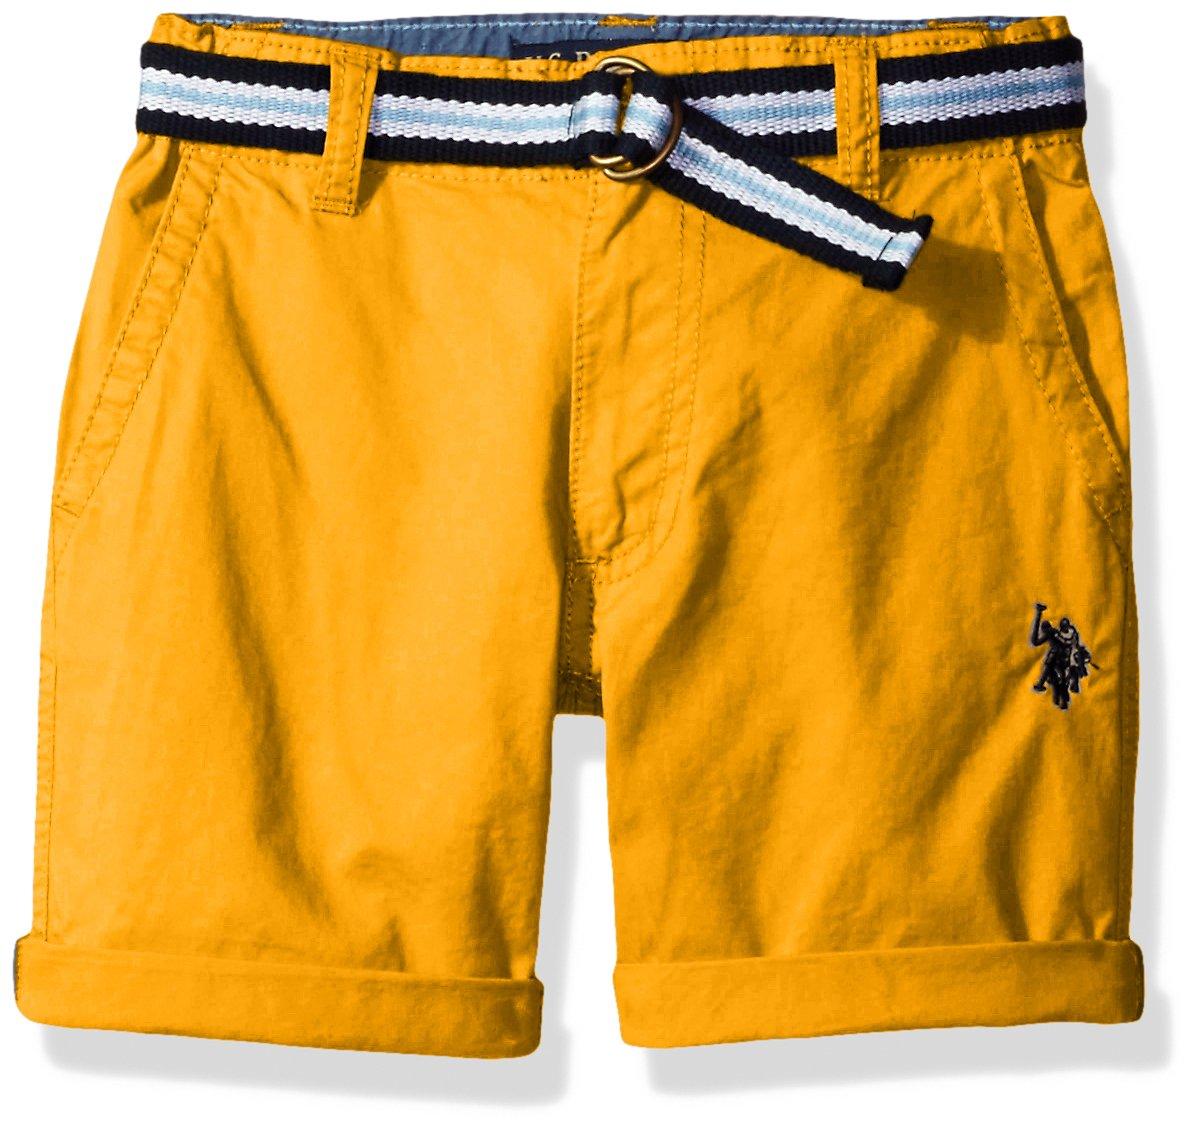 U.S. Polo Assn.. Boys' Fine Line Twill Short with Belt, Warhol Orange, 4